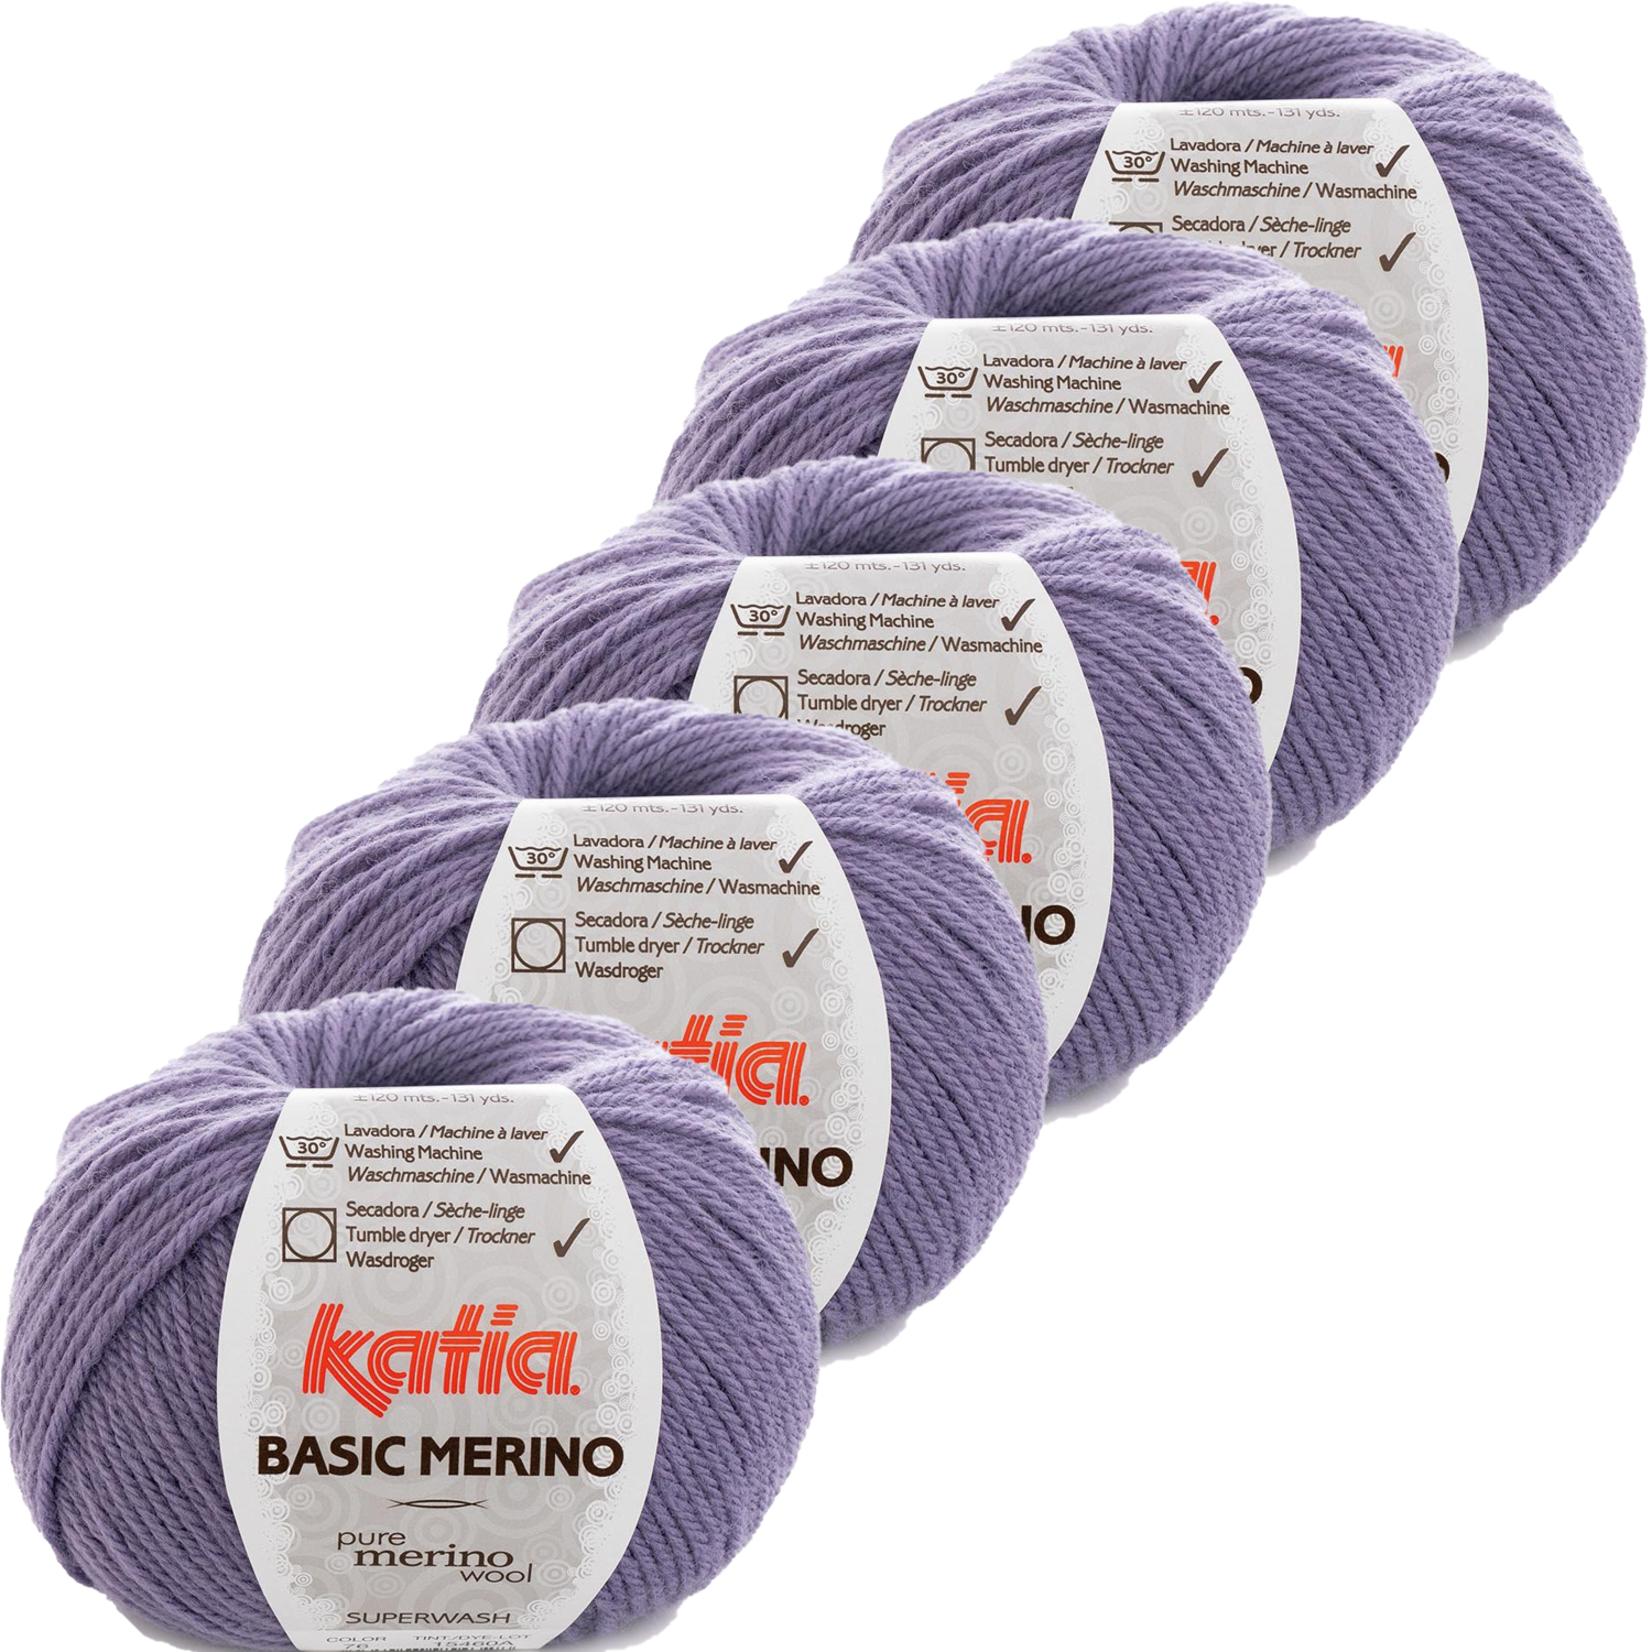 Katia Basic Merino - kleur 76_Lila - bundel 5 bollen 50 gr.  van 120 m.